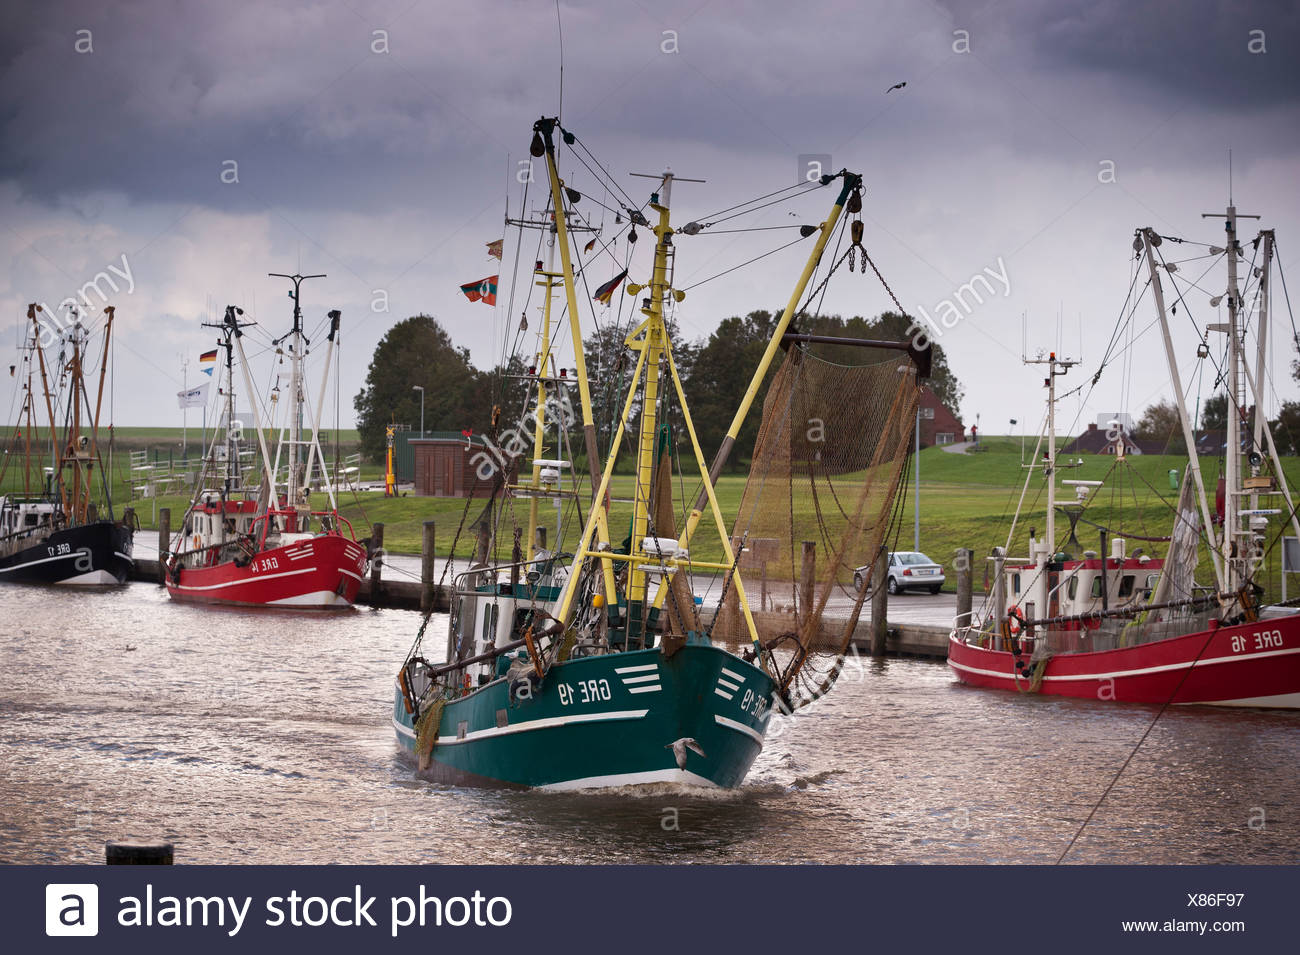 Arrastrero shrimper camarones o en el puerto de Greetsiel, Frisia Oriental, Baja Sajonia, Alemania, Europa Foto de stock